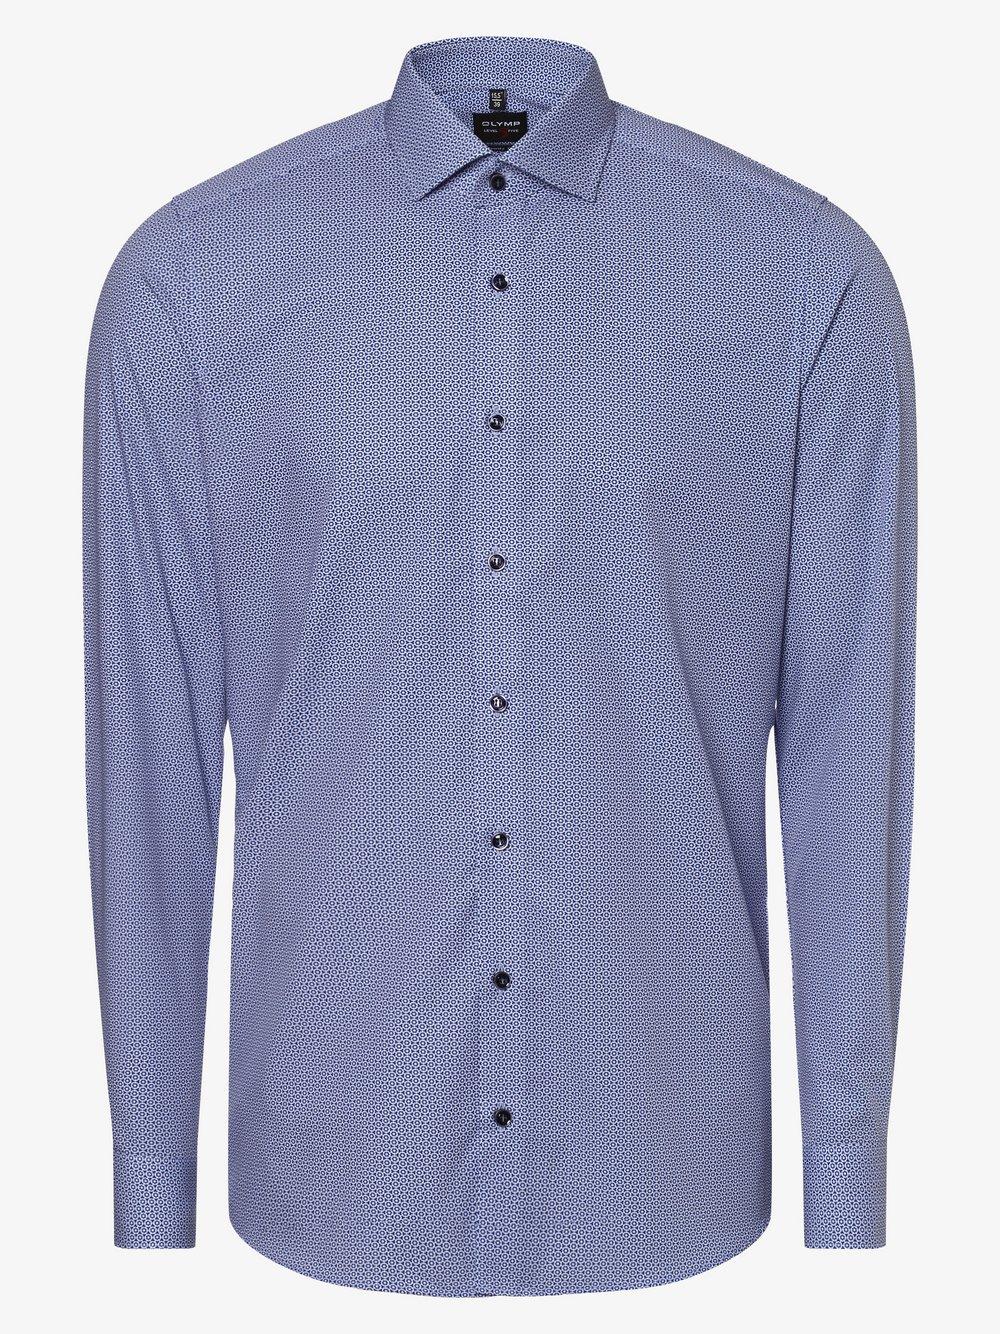 Olymp Level Five – Koszula męska łatwa w prasowaniu, niebieski Van Graaf 460051-0001